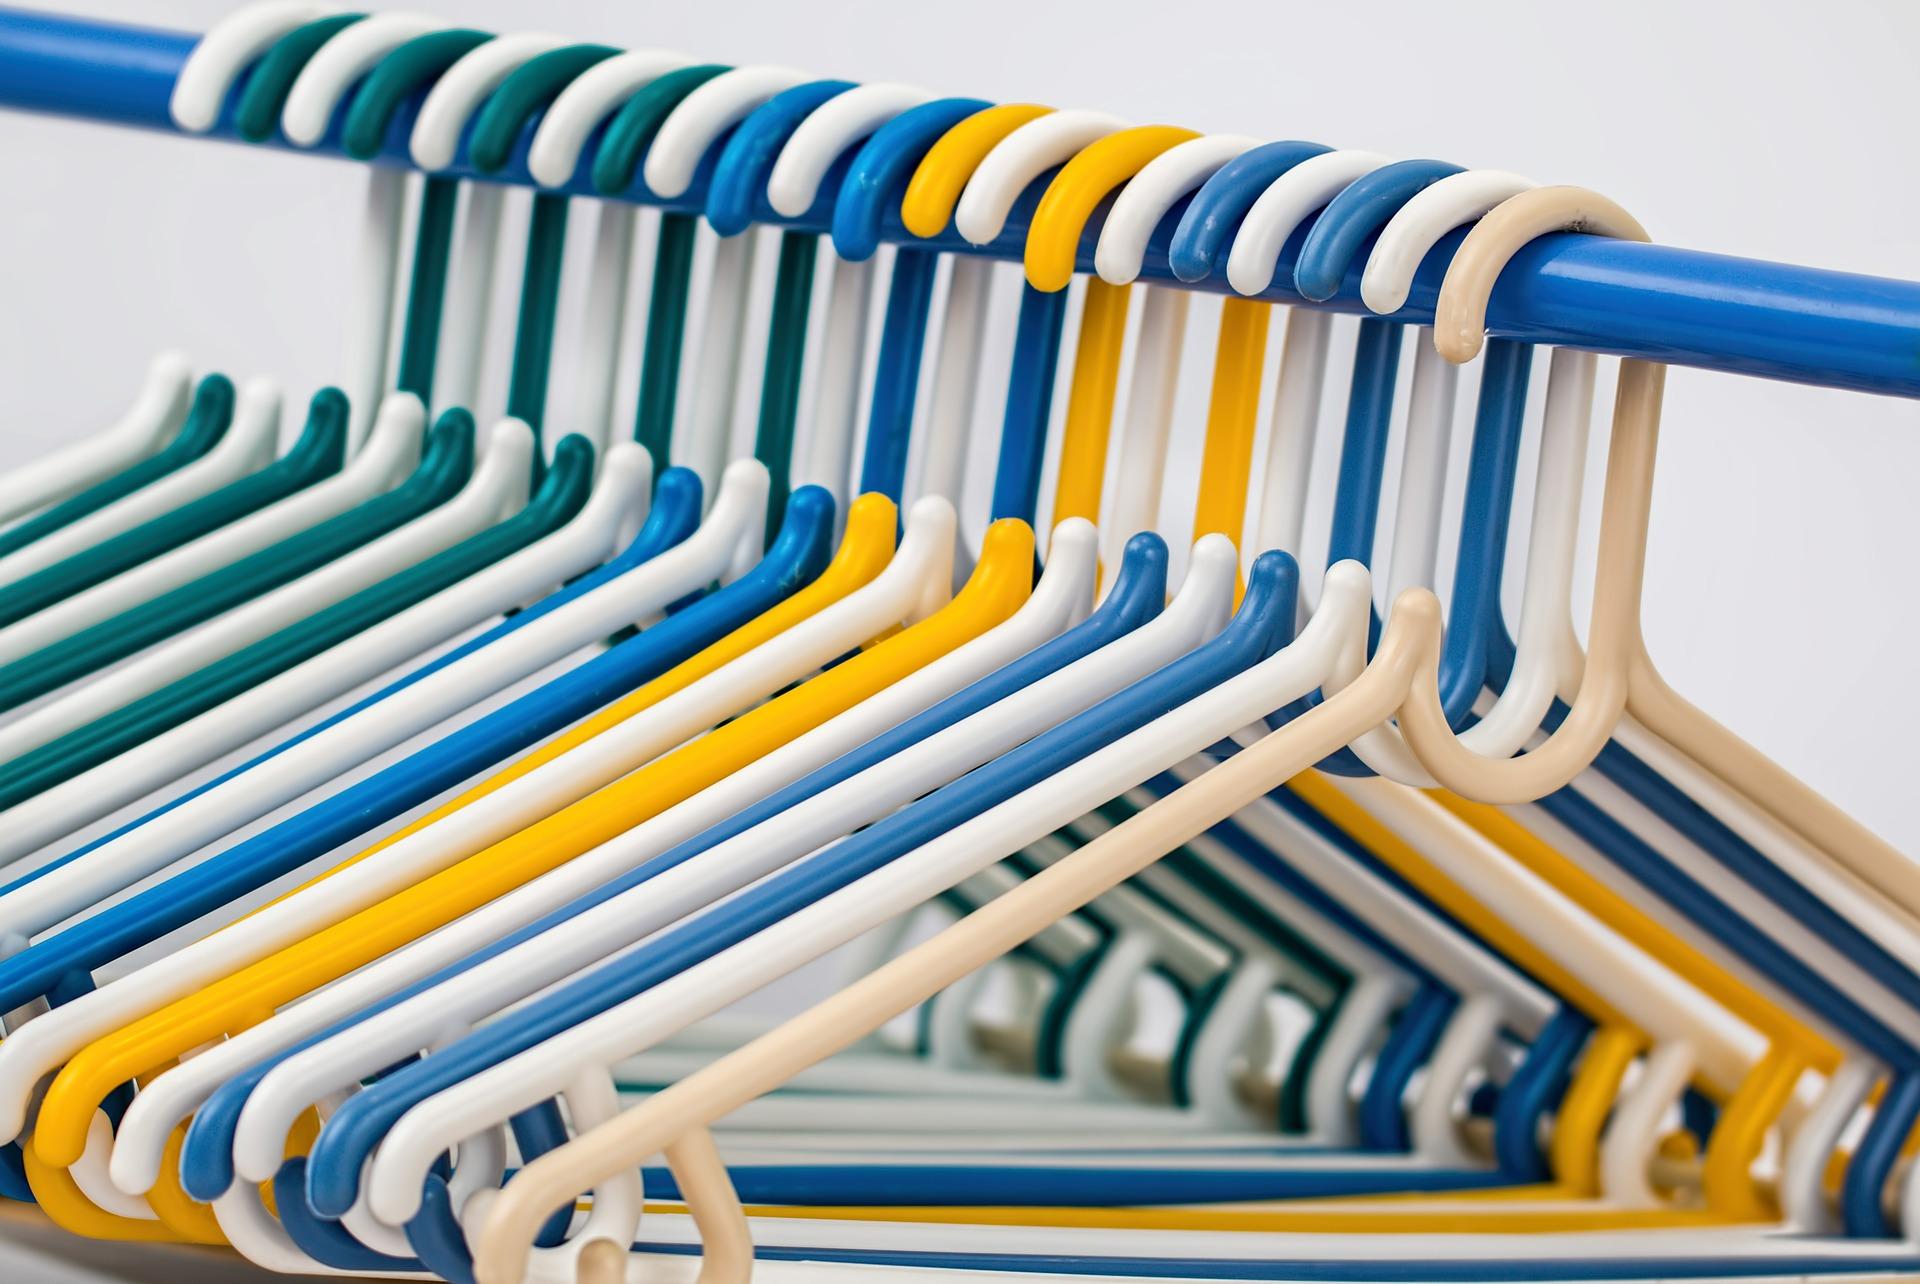 clothes-hangers-582212_1920